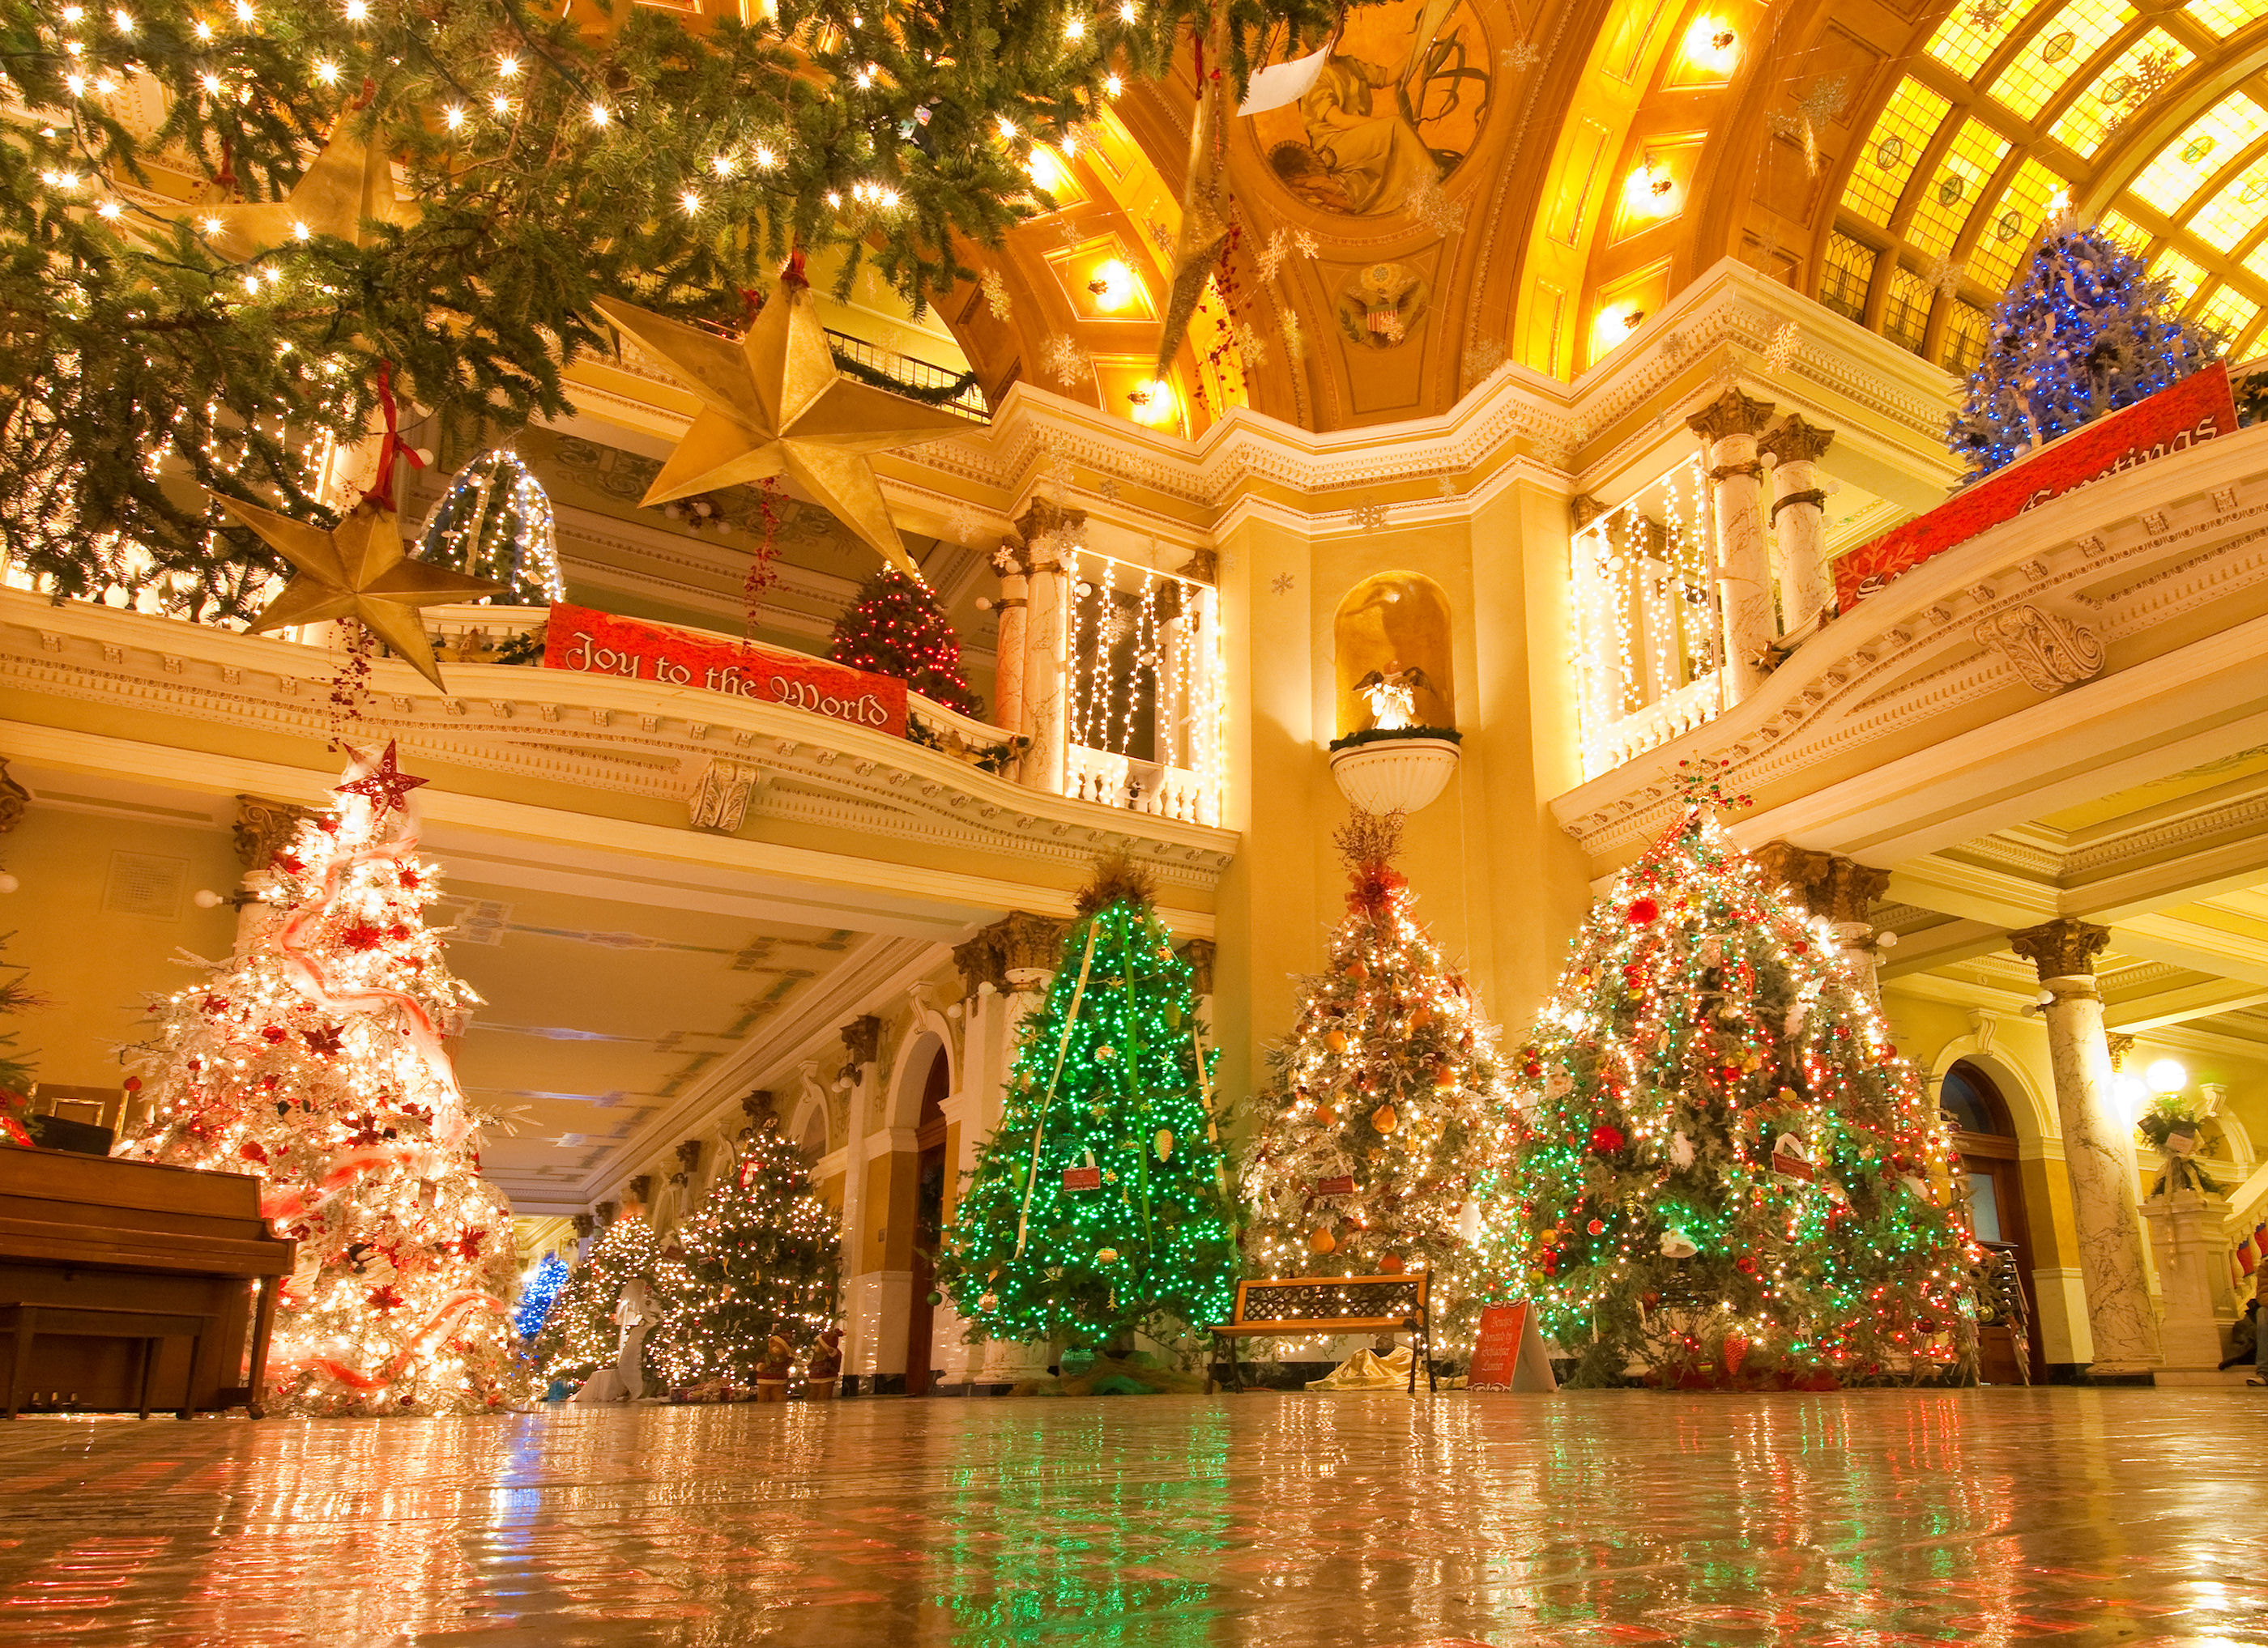 Christmas at the Capitol - South Dakota - Travel & Tourism Site